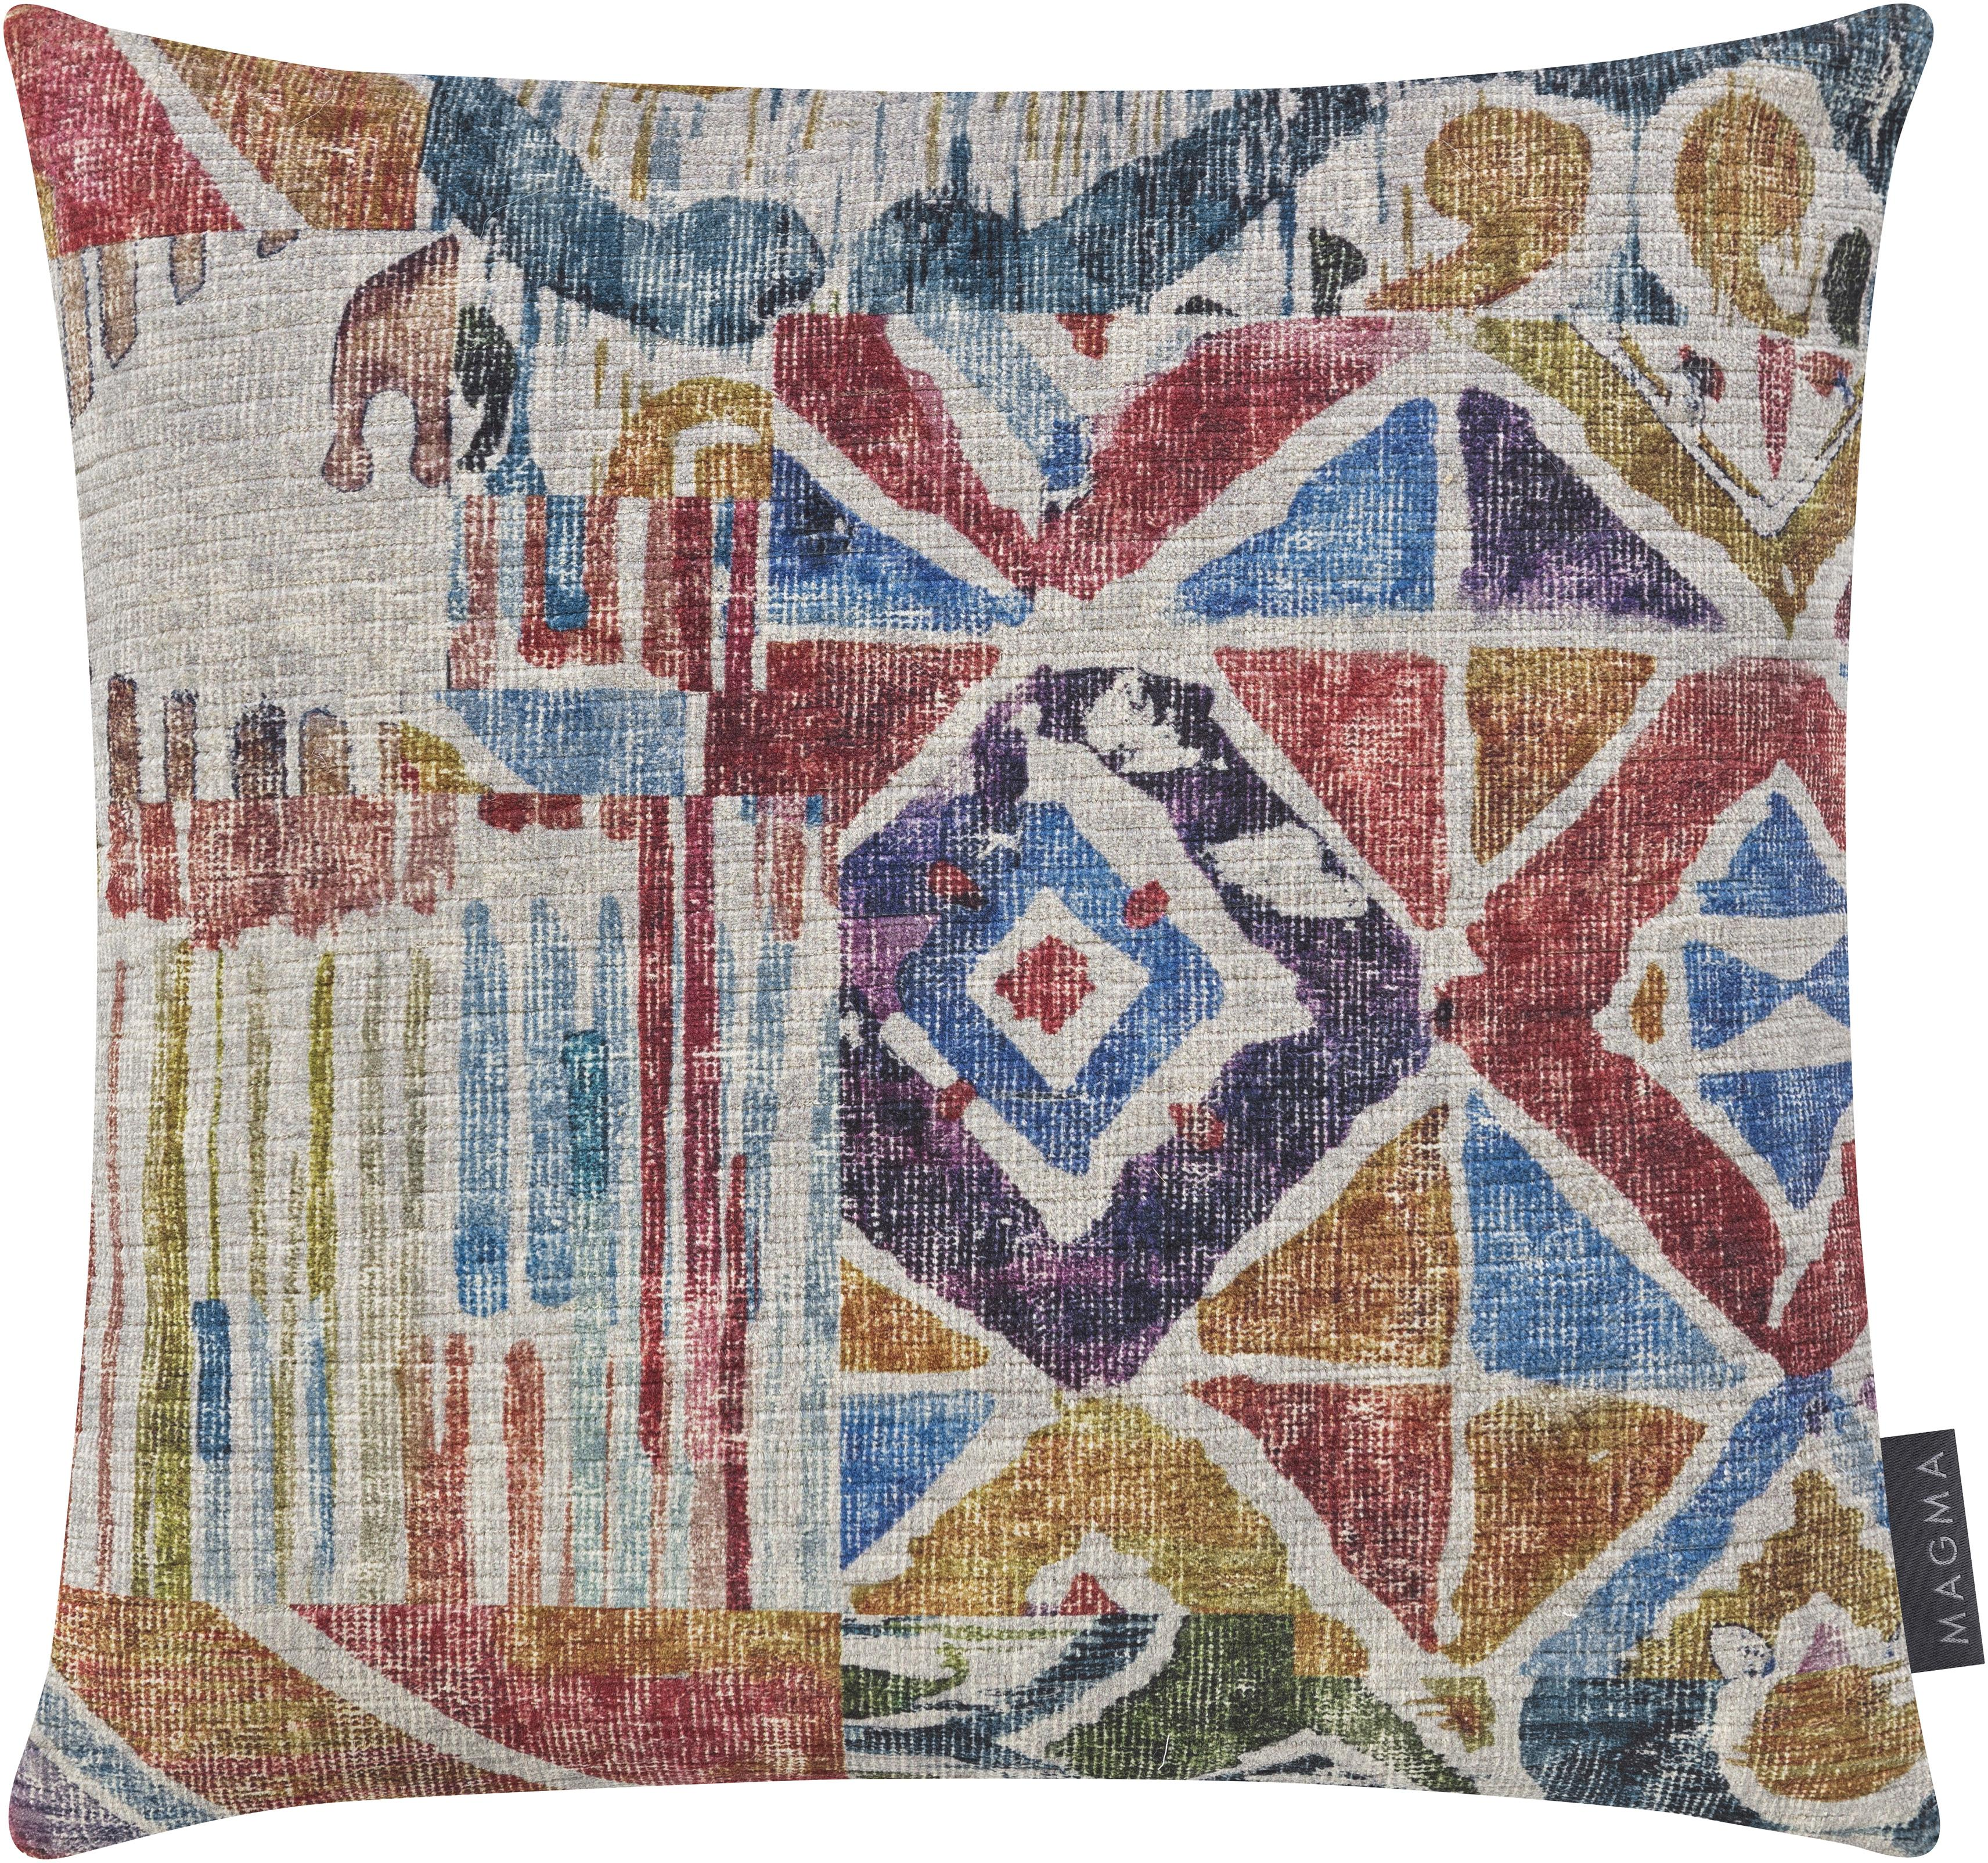 Funda de cojín de terciopelo Cosima, Terciopelo de poliéster, Color vino, multicolor, An 40 x L 40 cm